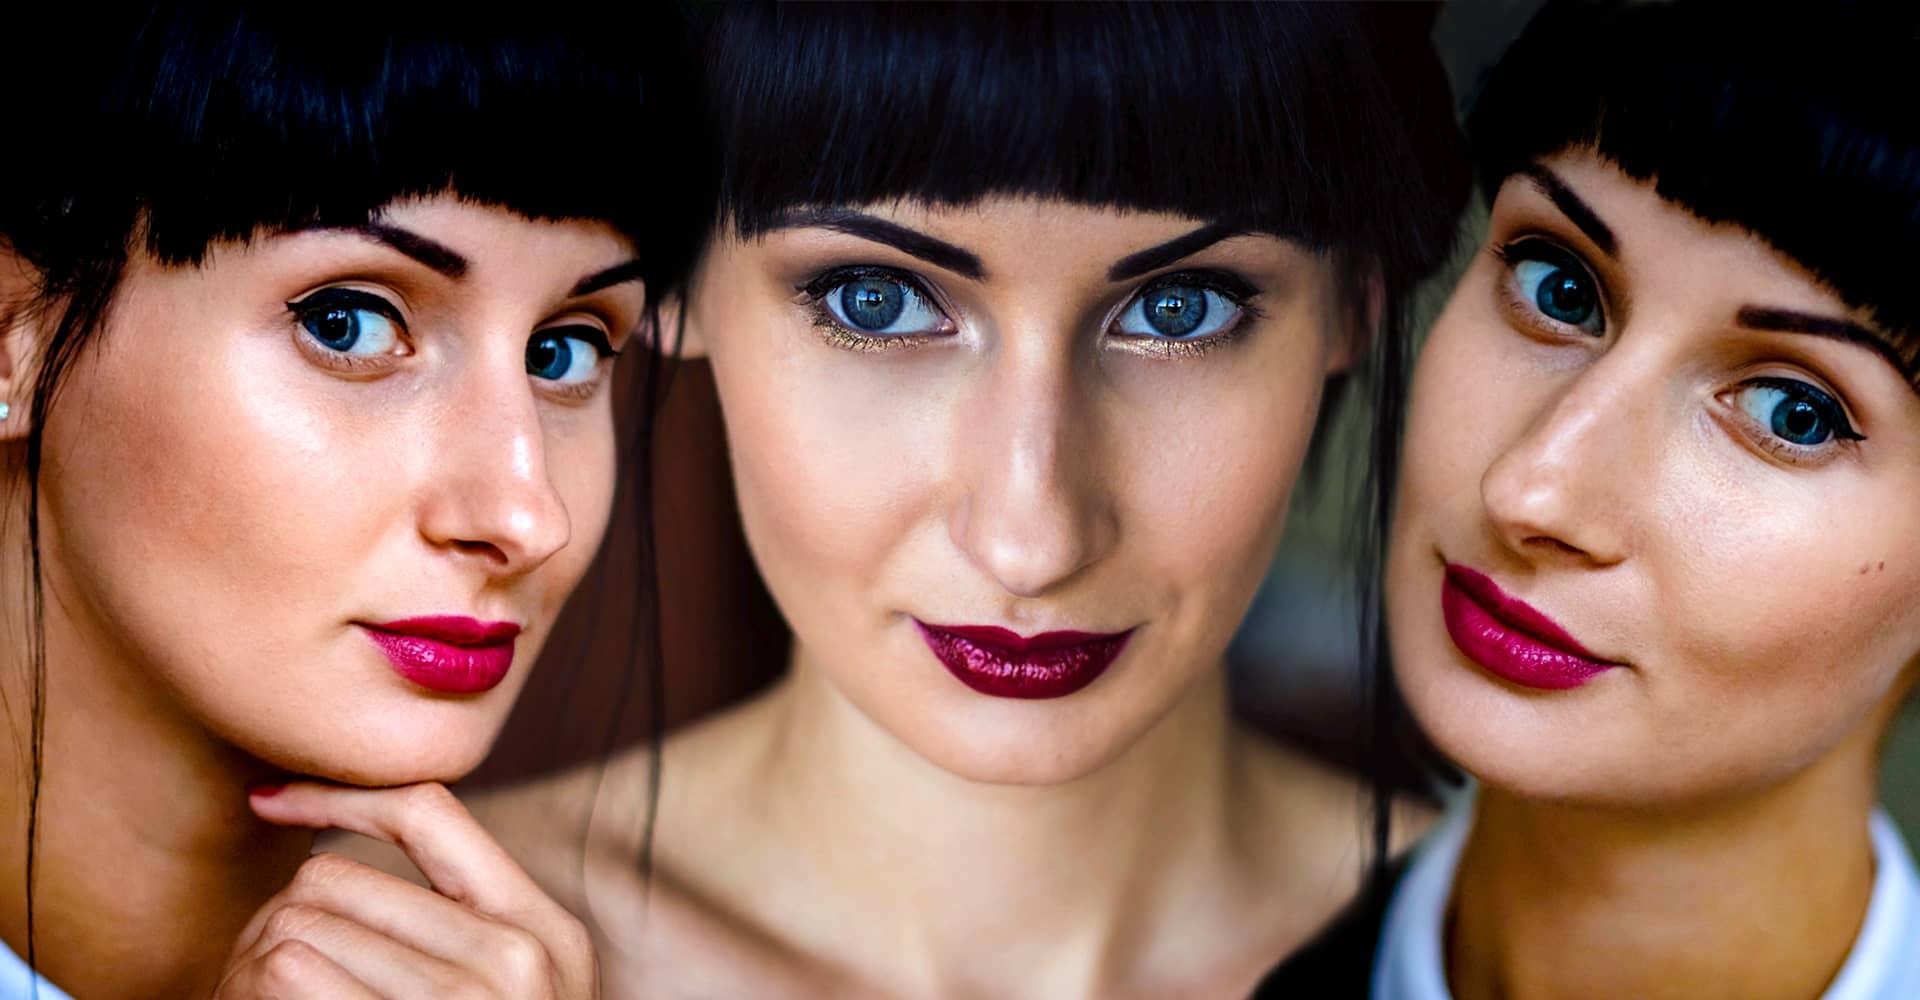 Blue eyes morfopsicologia